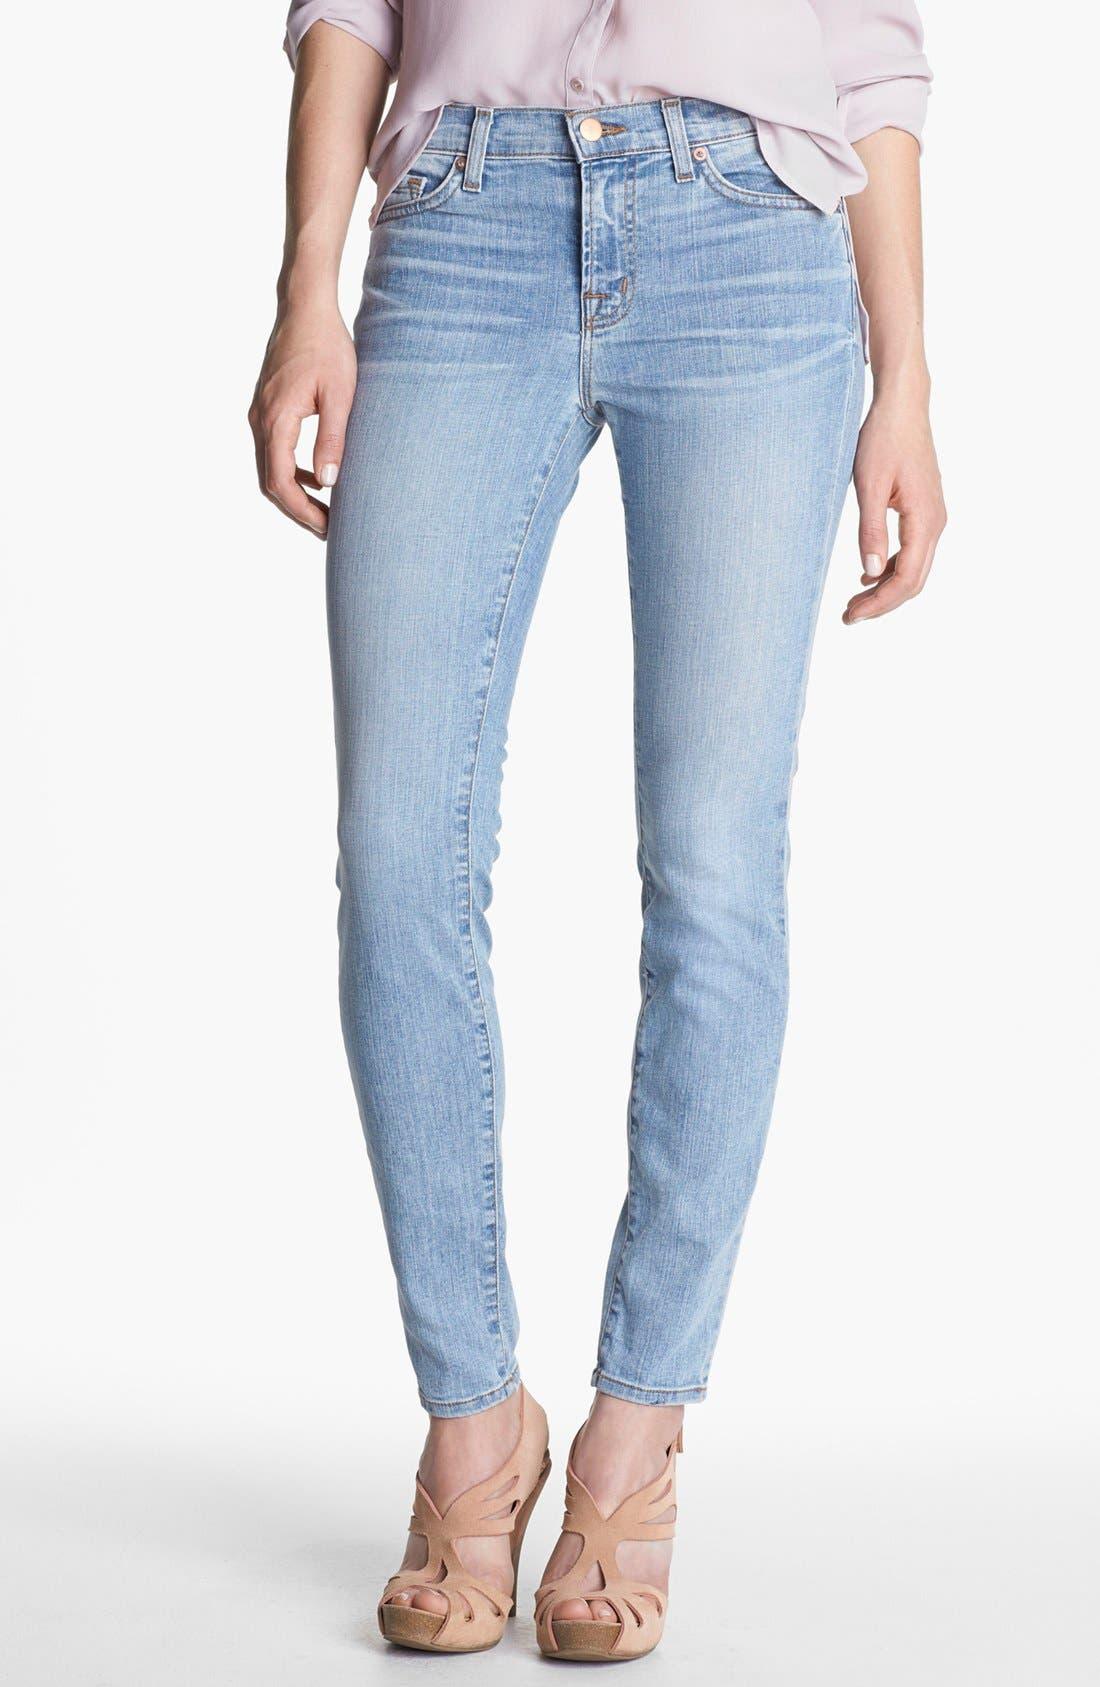 Alternate Image 1 Selected - J Brand '811' Mid-Rise Skinny Jeans (Orion)